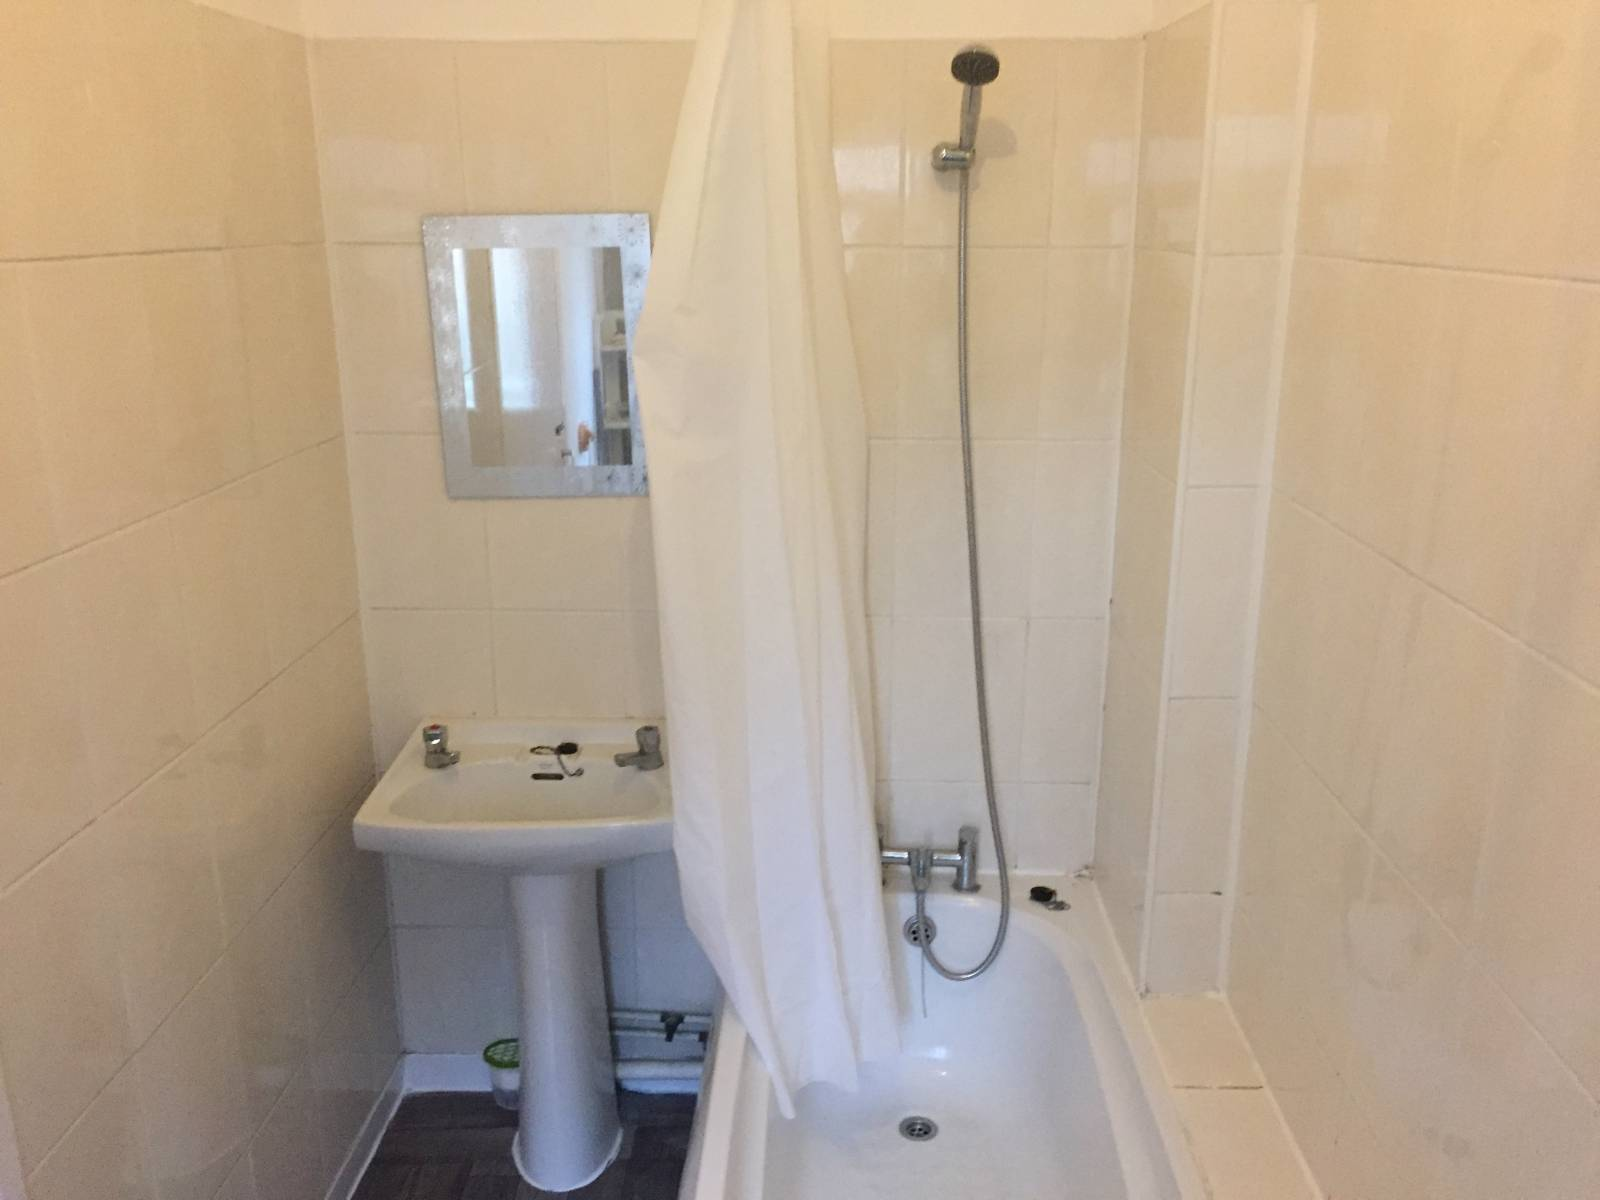 2 Story 1 large bedroom Maisonette. Totally refurbished. New Kitchen/Bathroom/Flooring. Redecorated.